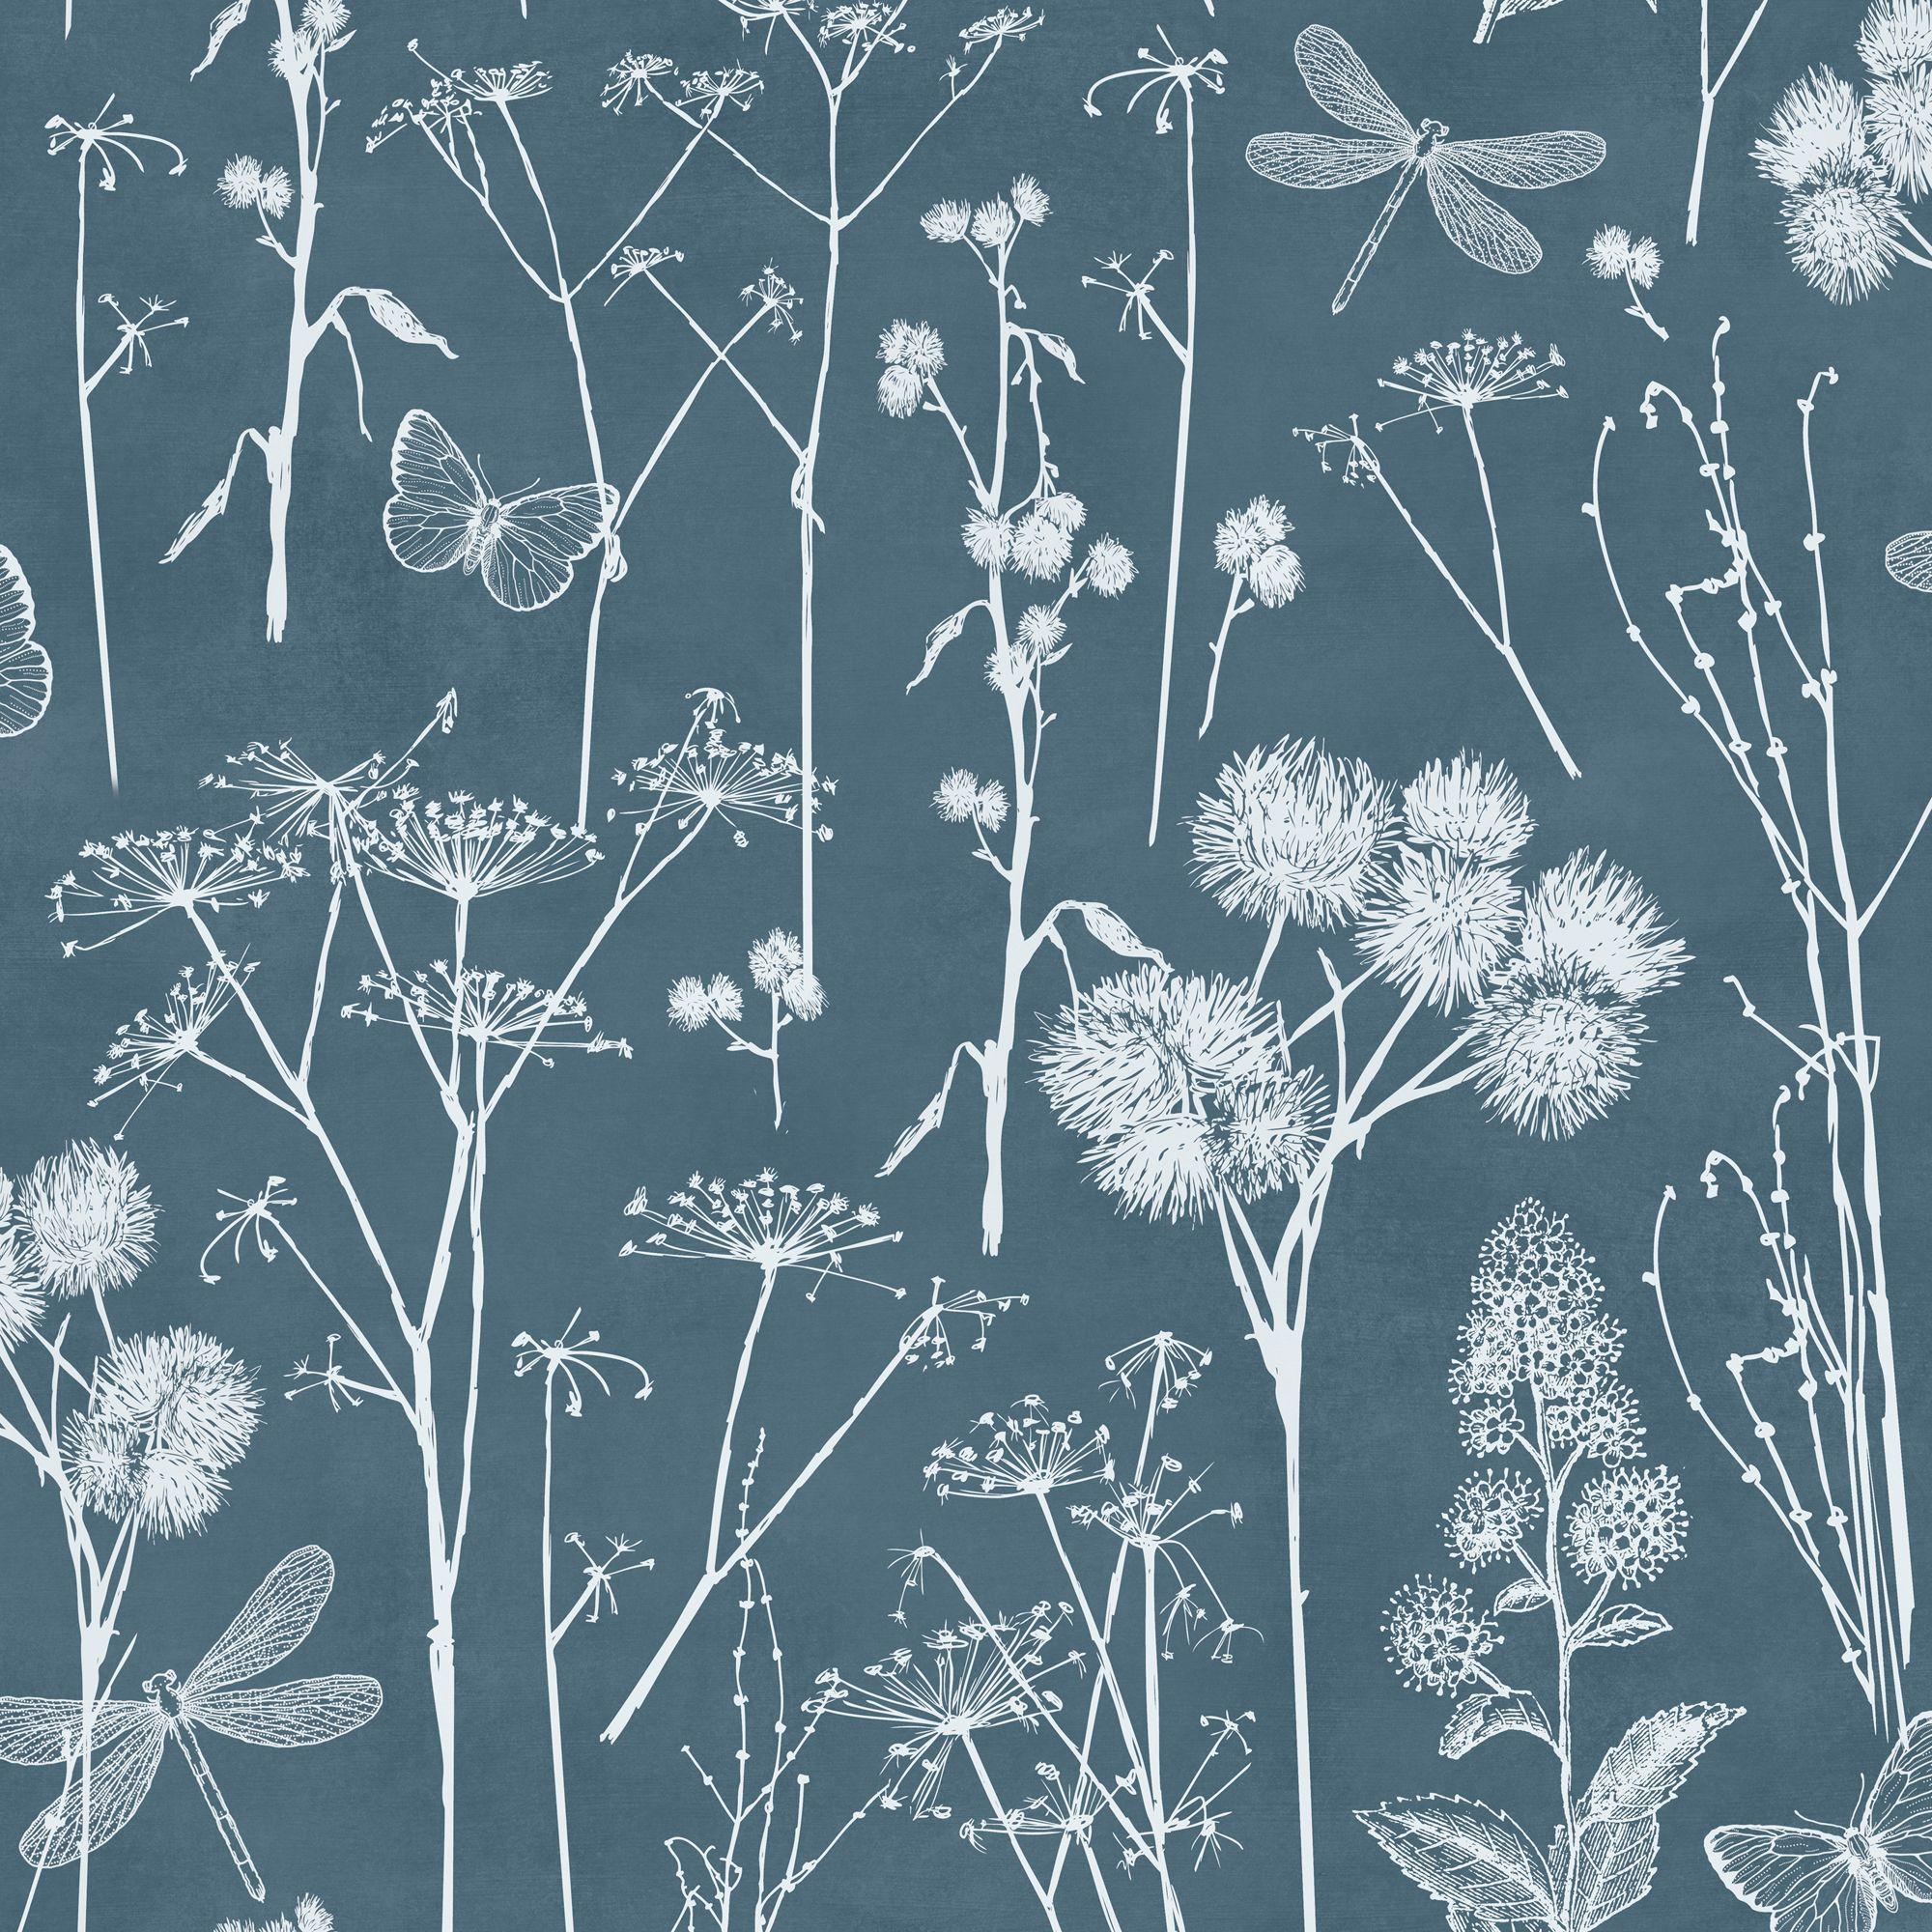 Best Botanical Blackboard Teal Foliage Wallpaper Departments Diy At B Q Modern Floral Wallpaper 400 x 300